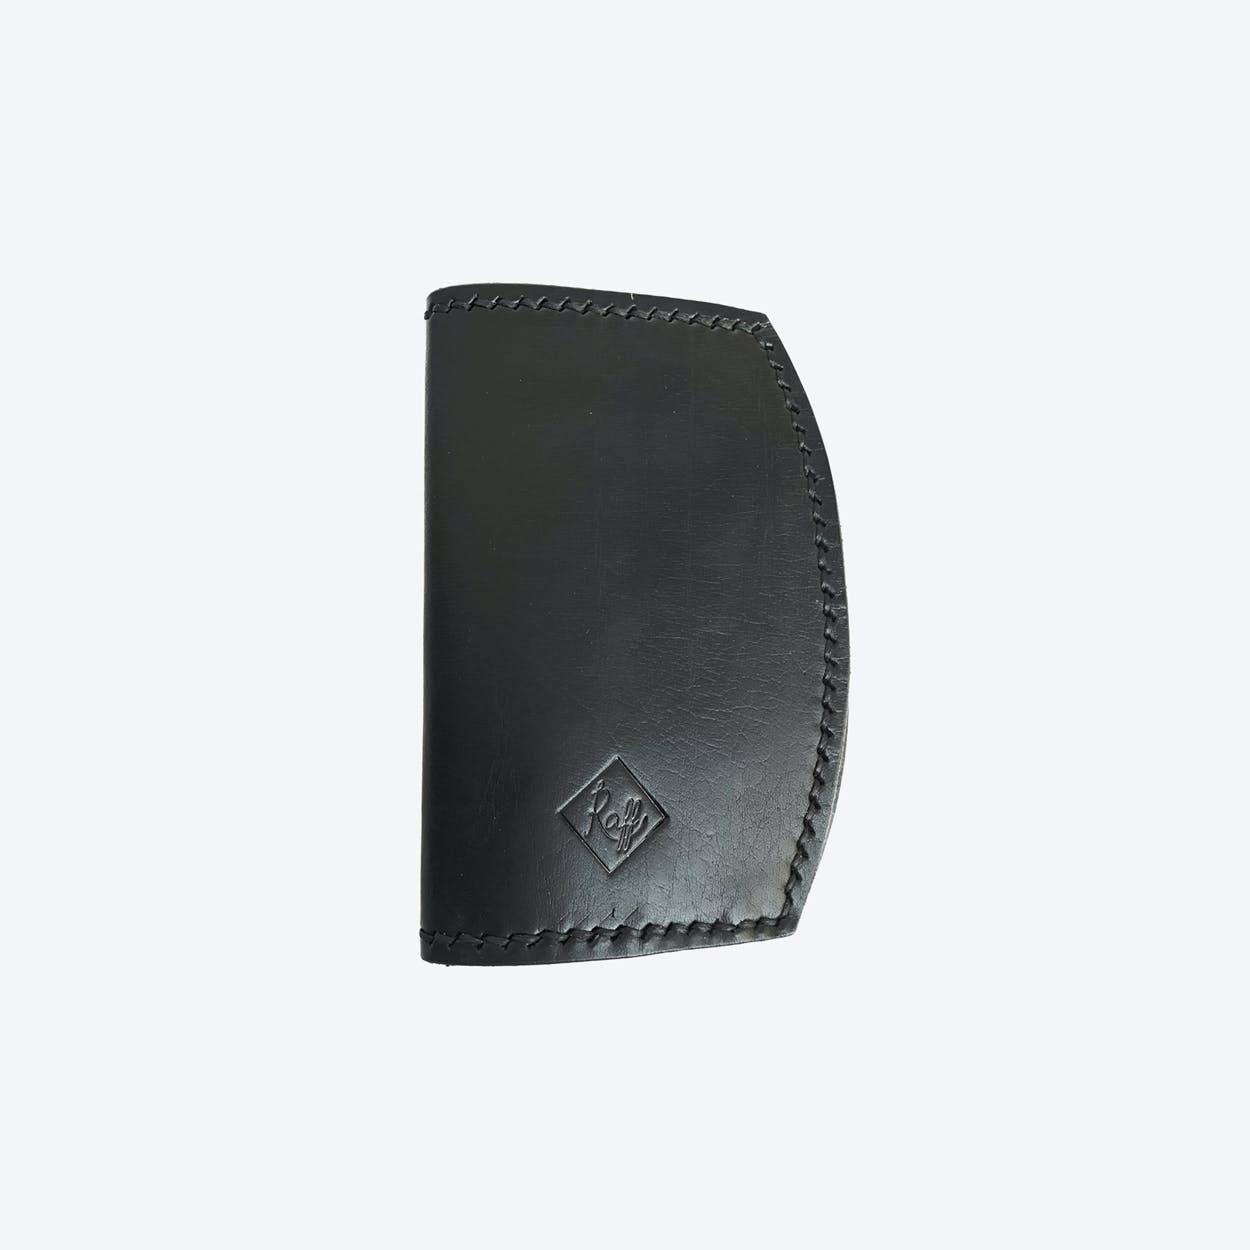 Iris Passport Holder in Black